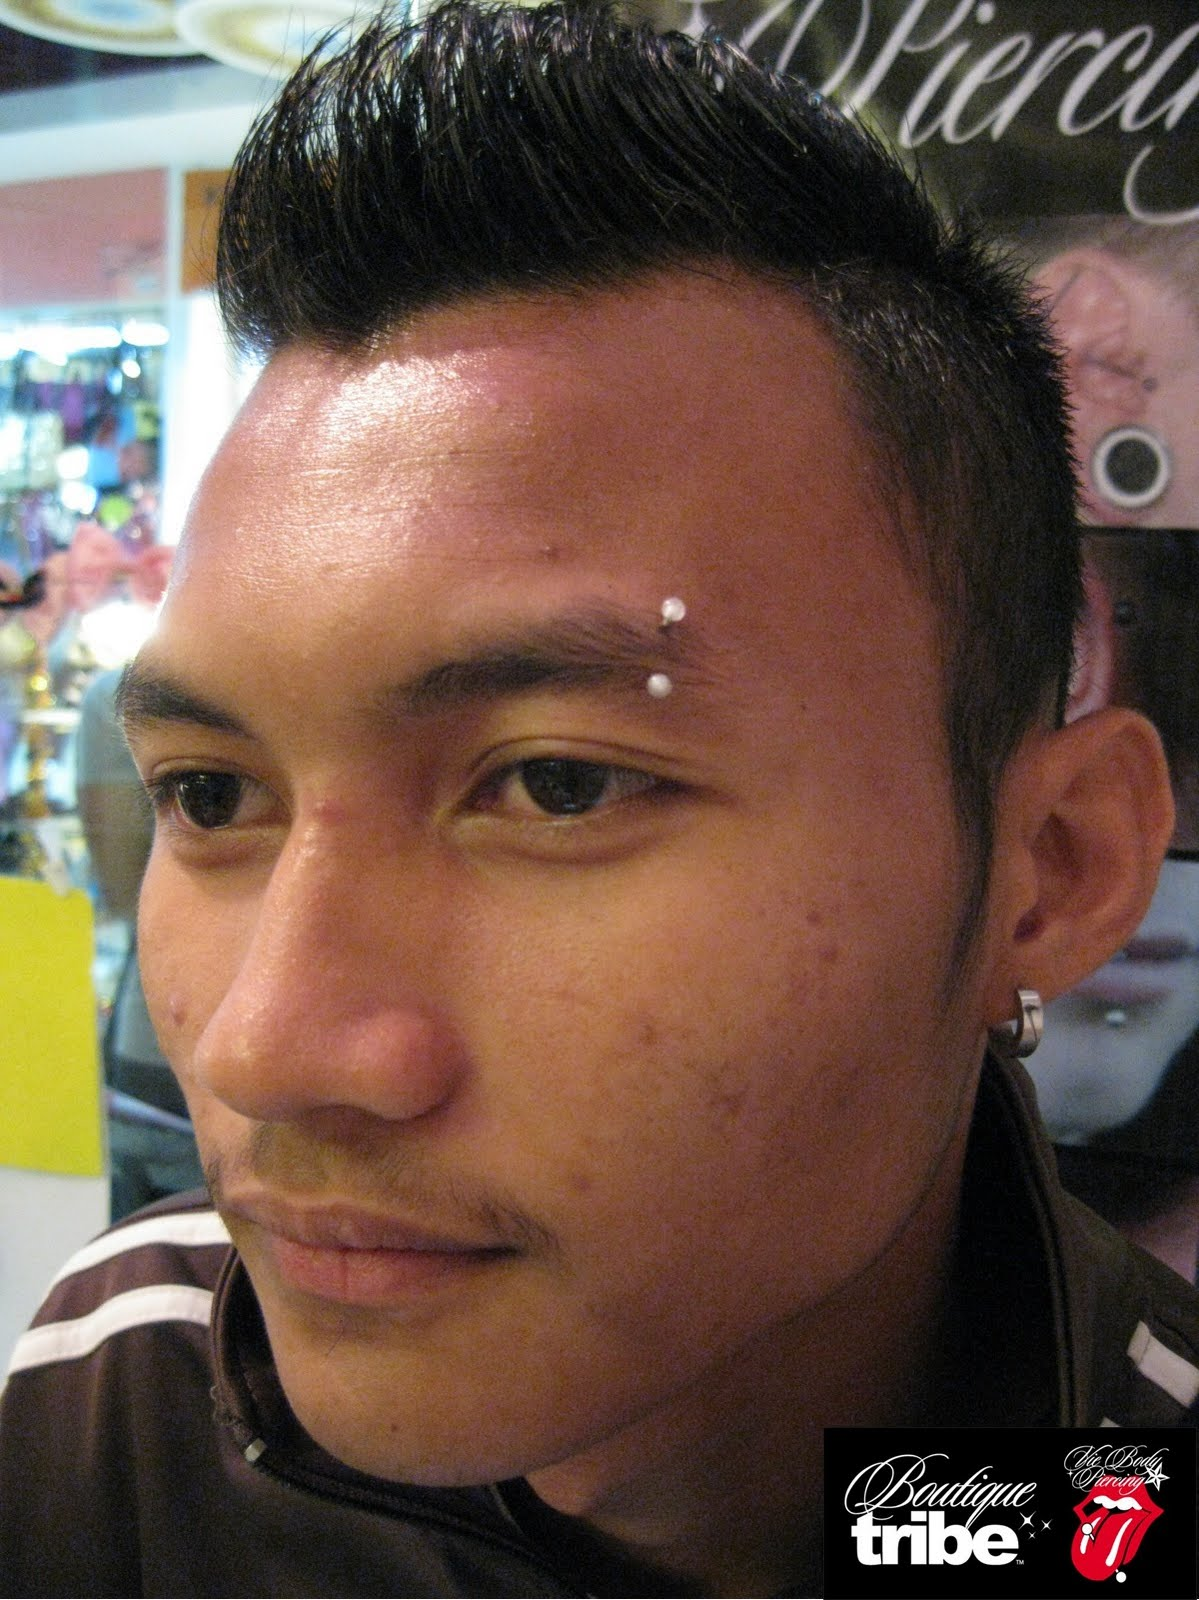 Vie Body Piercing Boutique Tribe Eyebrow Piercing